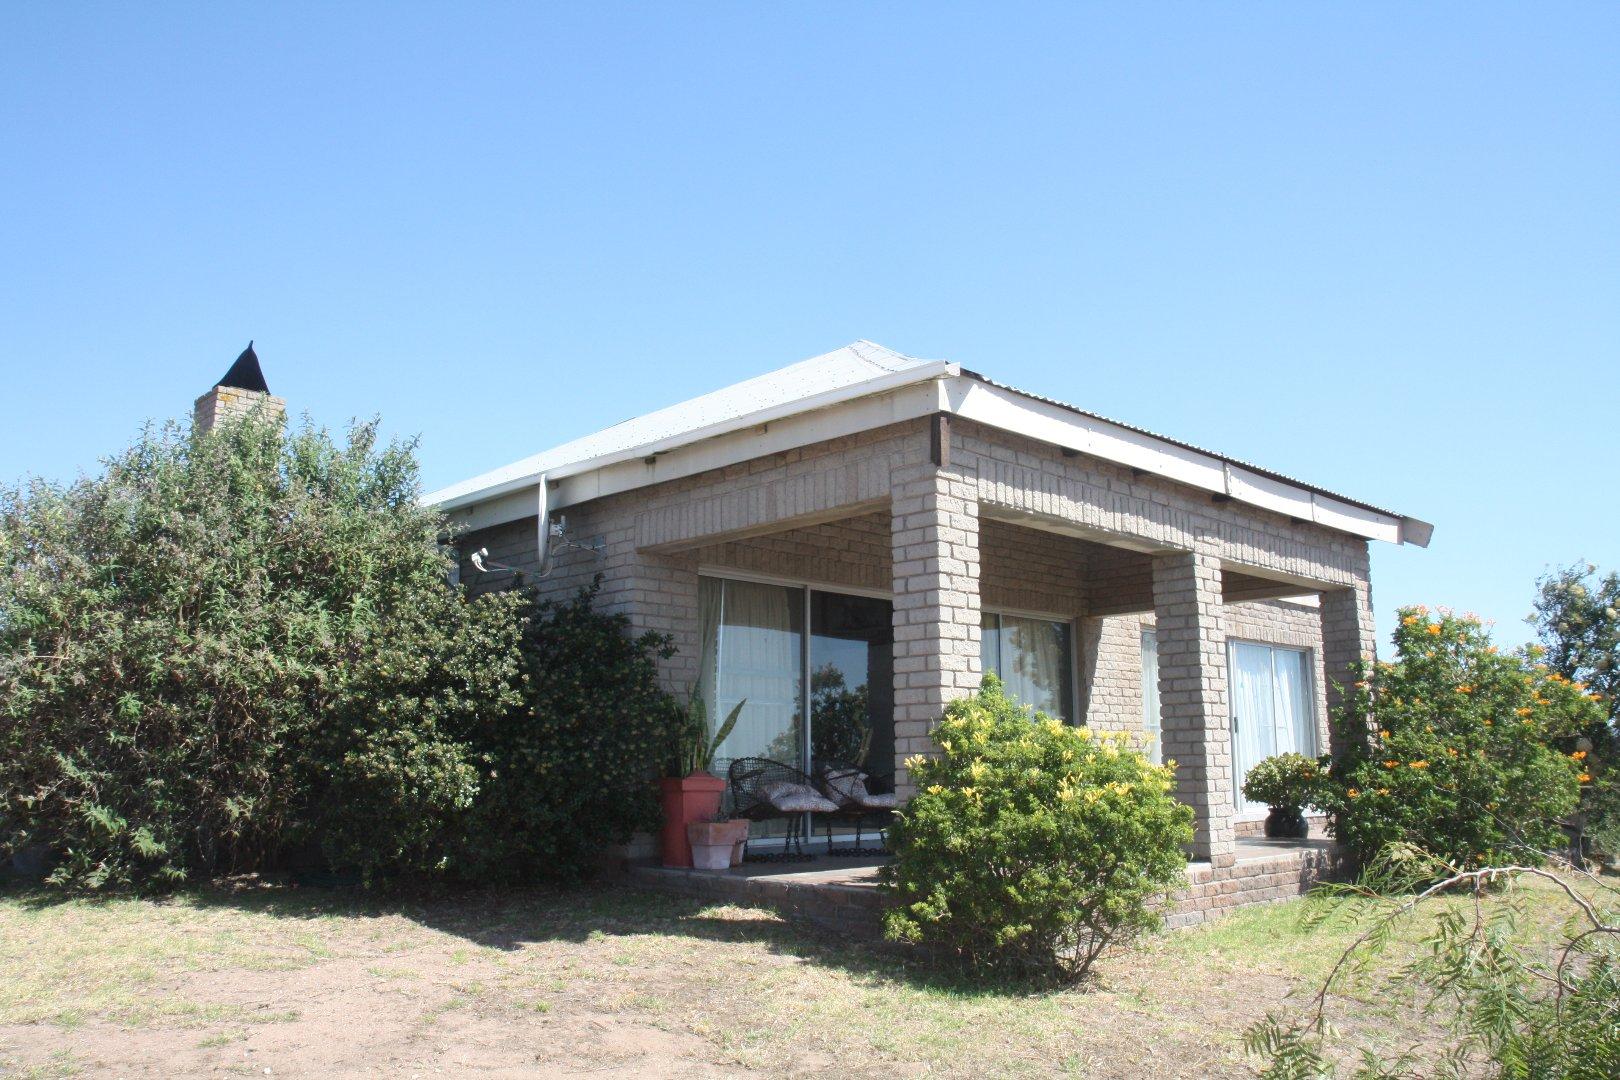 Vredenburg, Trekoskraal Property  | Houses For Sale Trekoskraal, Trekoskraal, Farms 3 bedrooms property for sale Price:2,310,000